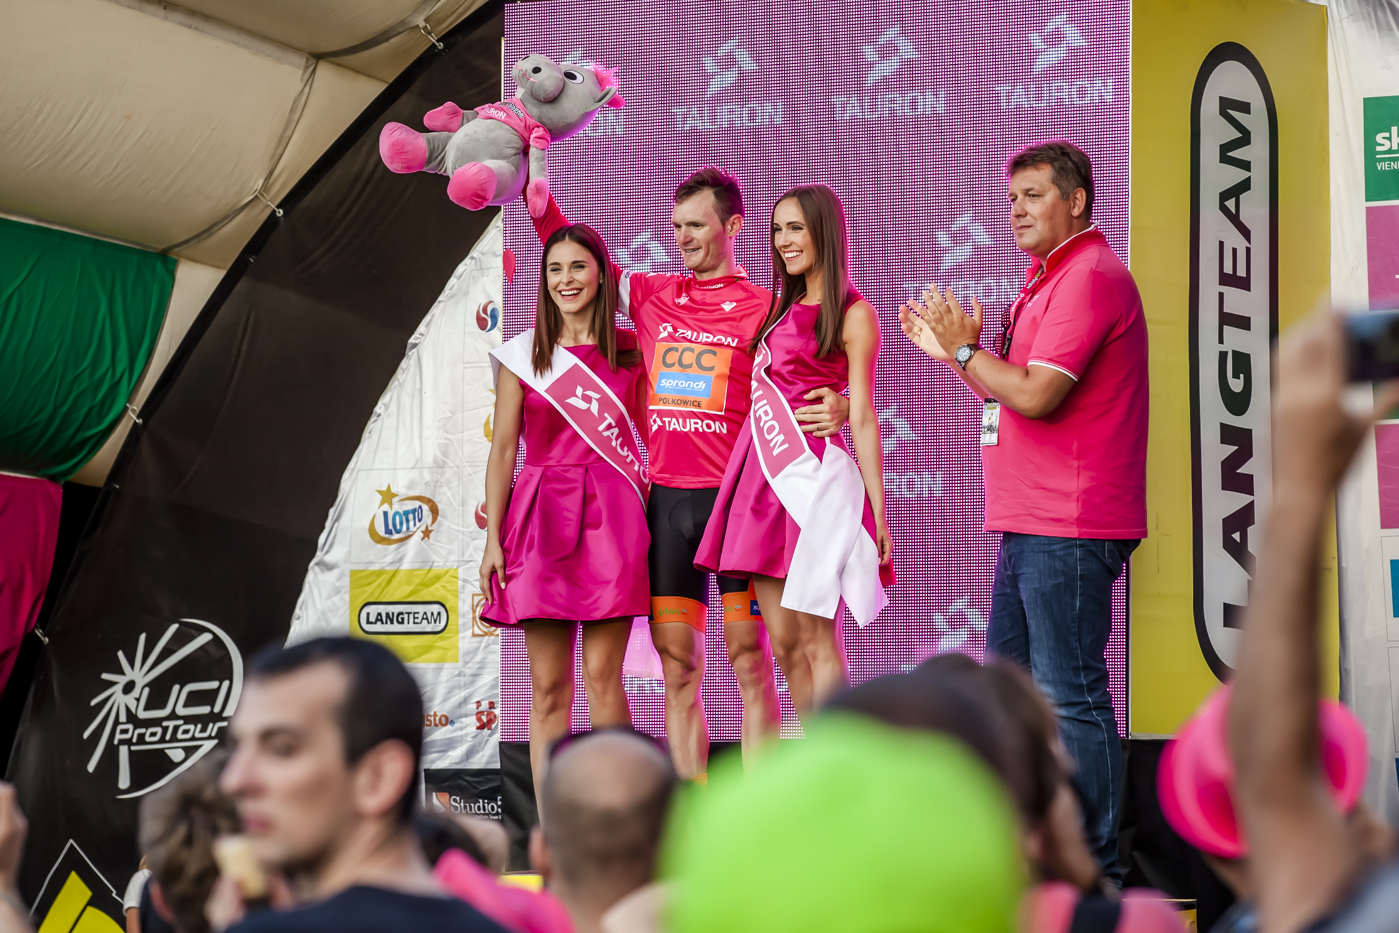 http://magazynrowerowy.pl/logmein/wp-content/uploads/2015/08/TdP_V-etap_0688.jpg